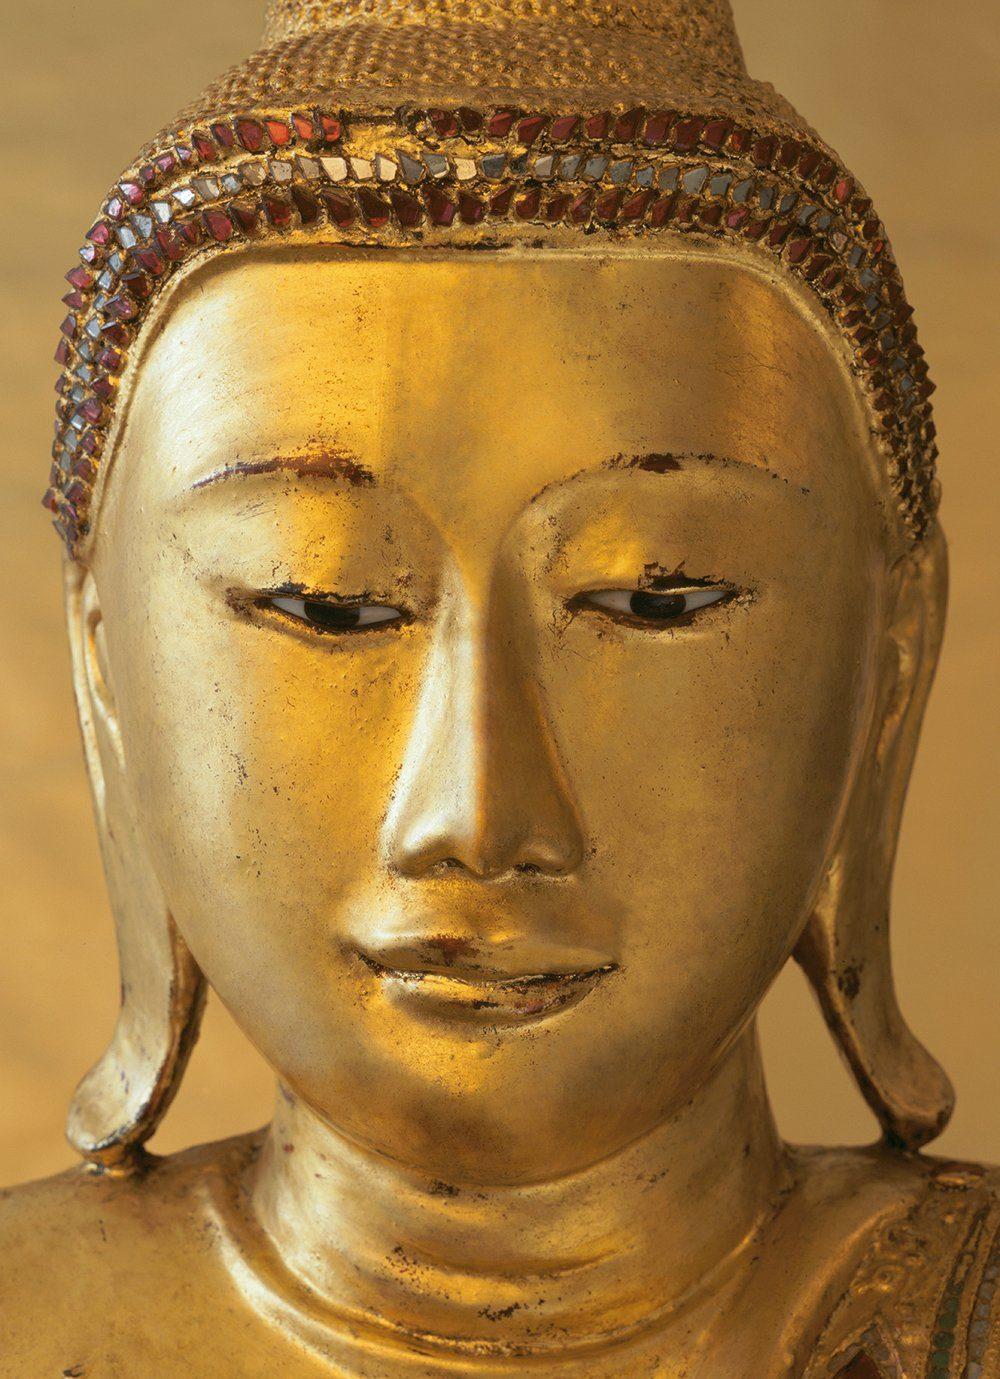 Fototapete »Golden Buddha«, 4-teilig, 183x254 cm